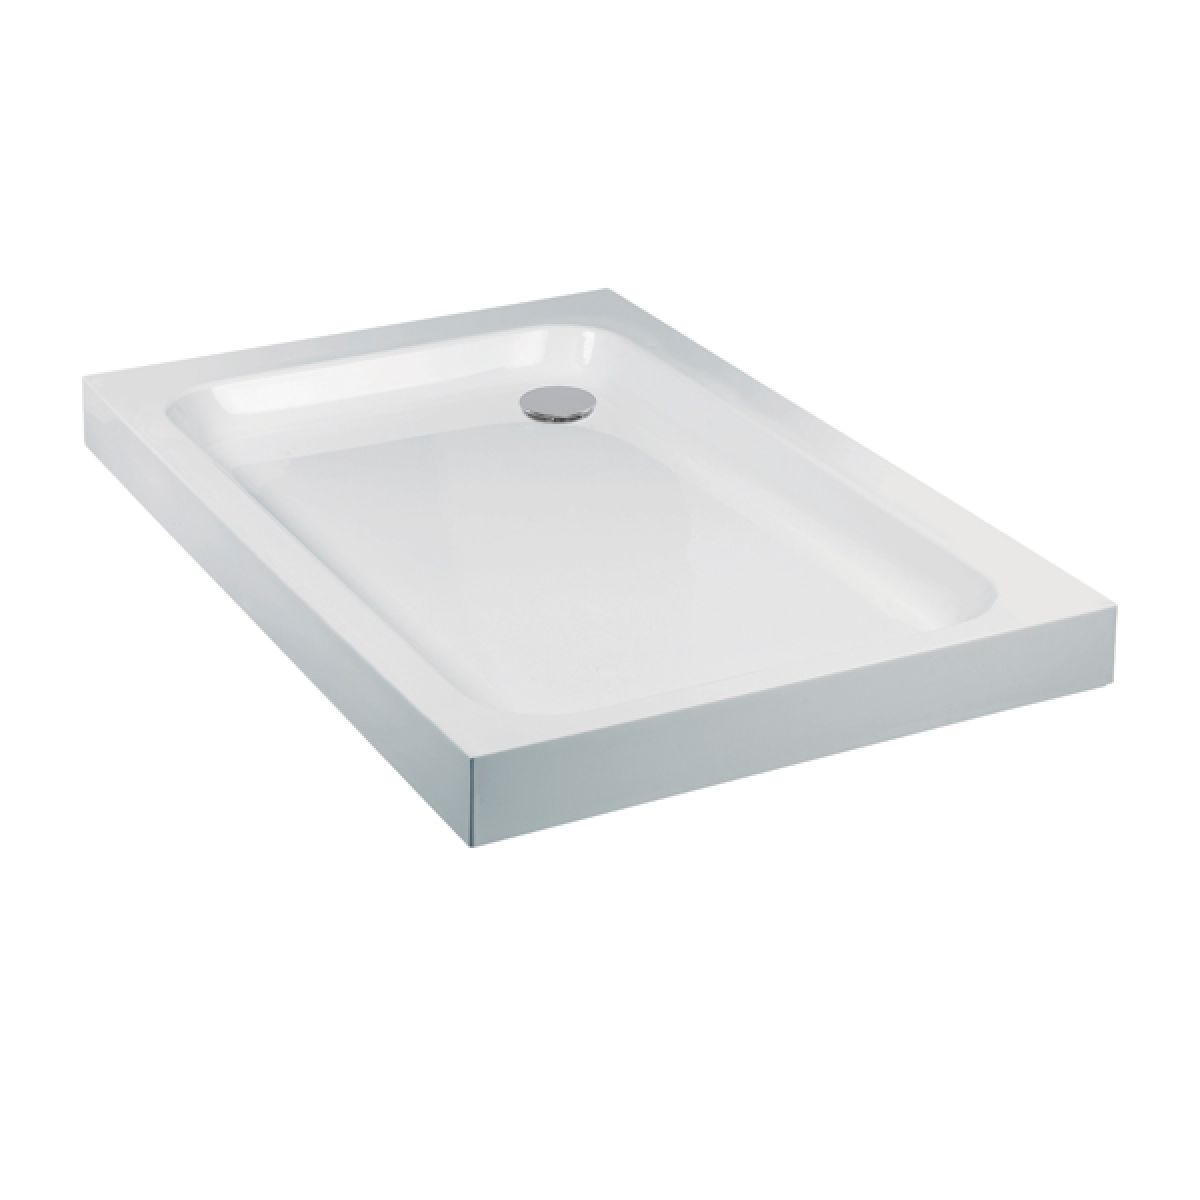 Frontline Standard Rectanglular Shower Tray 900 x 700mm